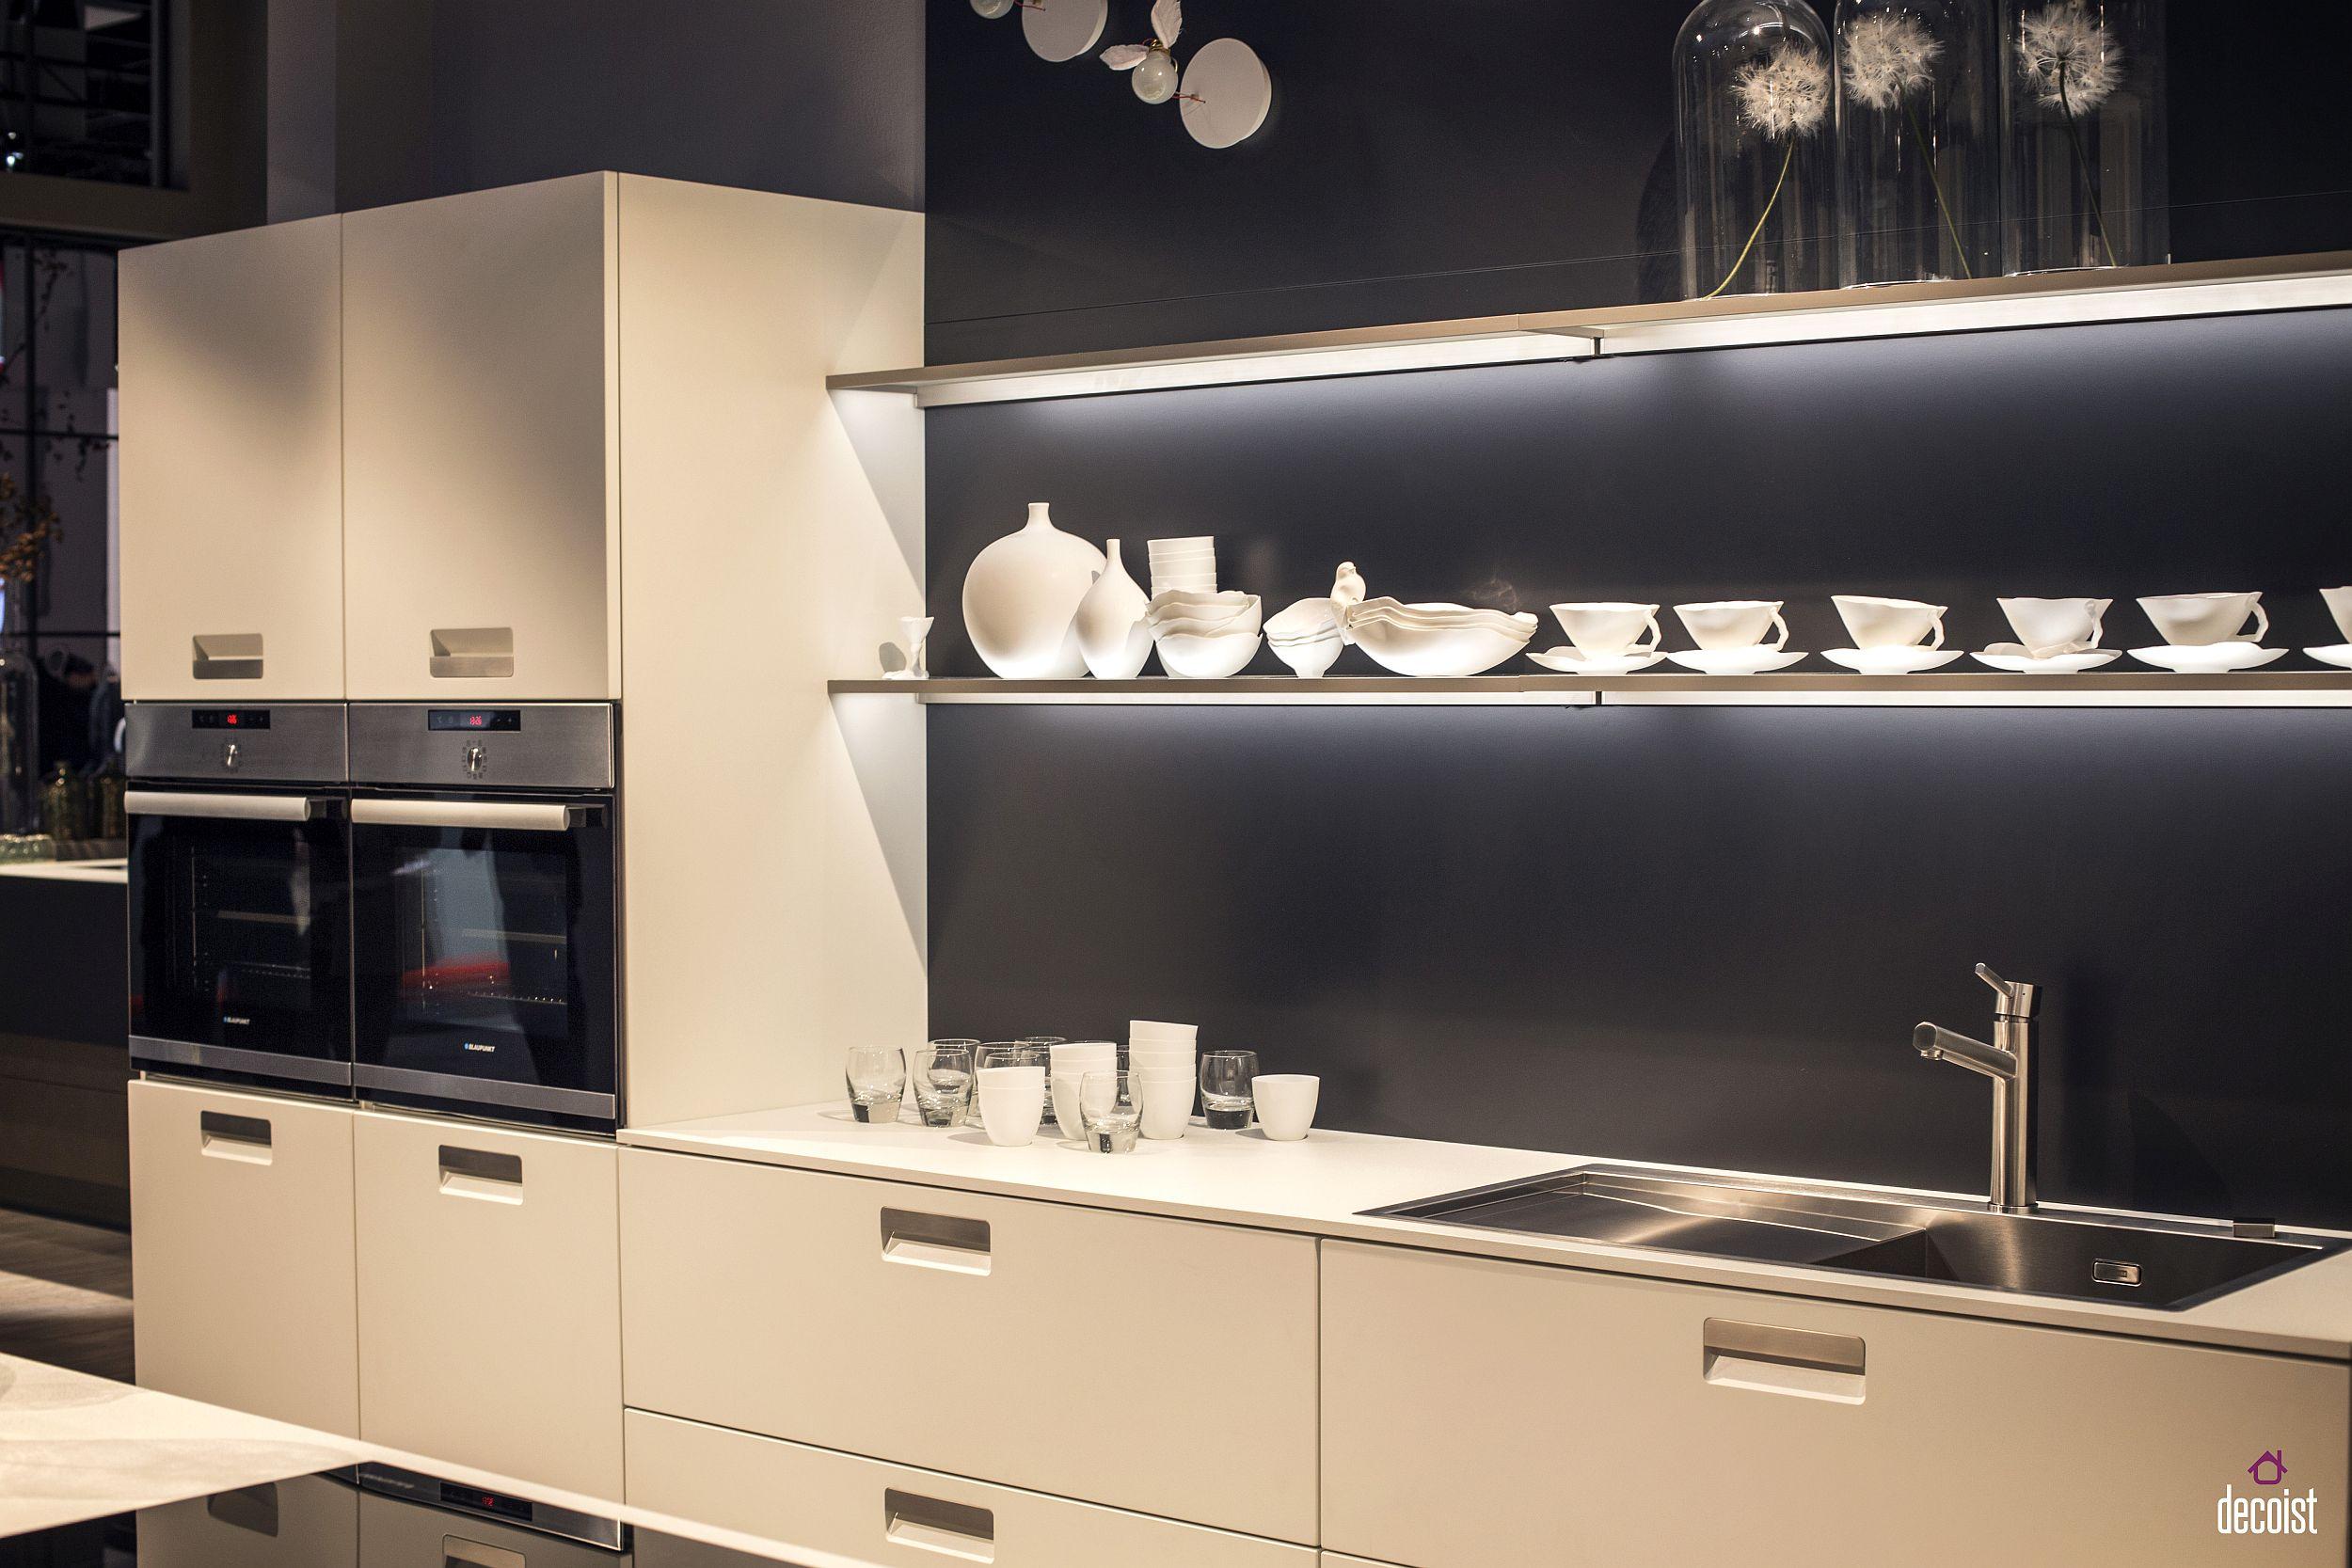 Illuminated-glass-shelves-for-the-kitchen